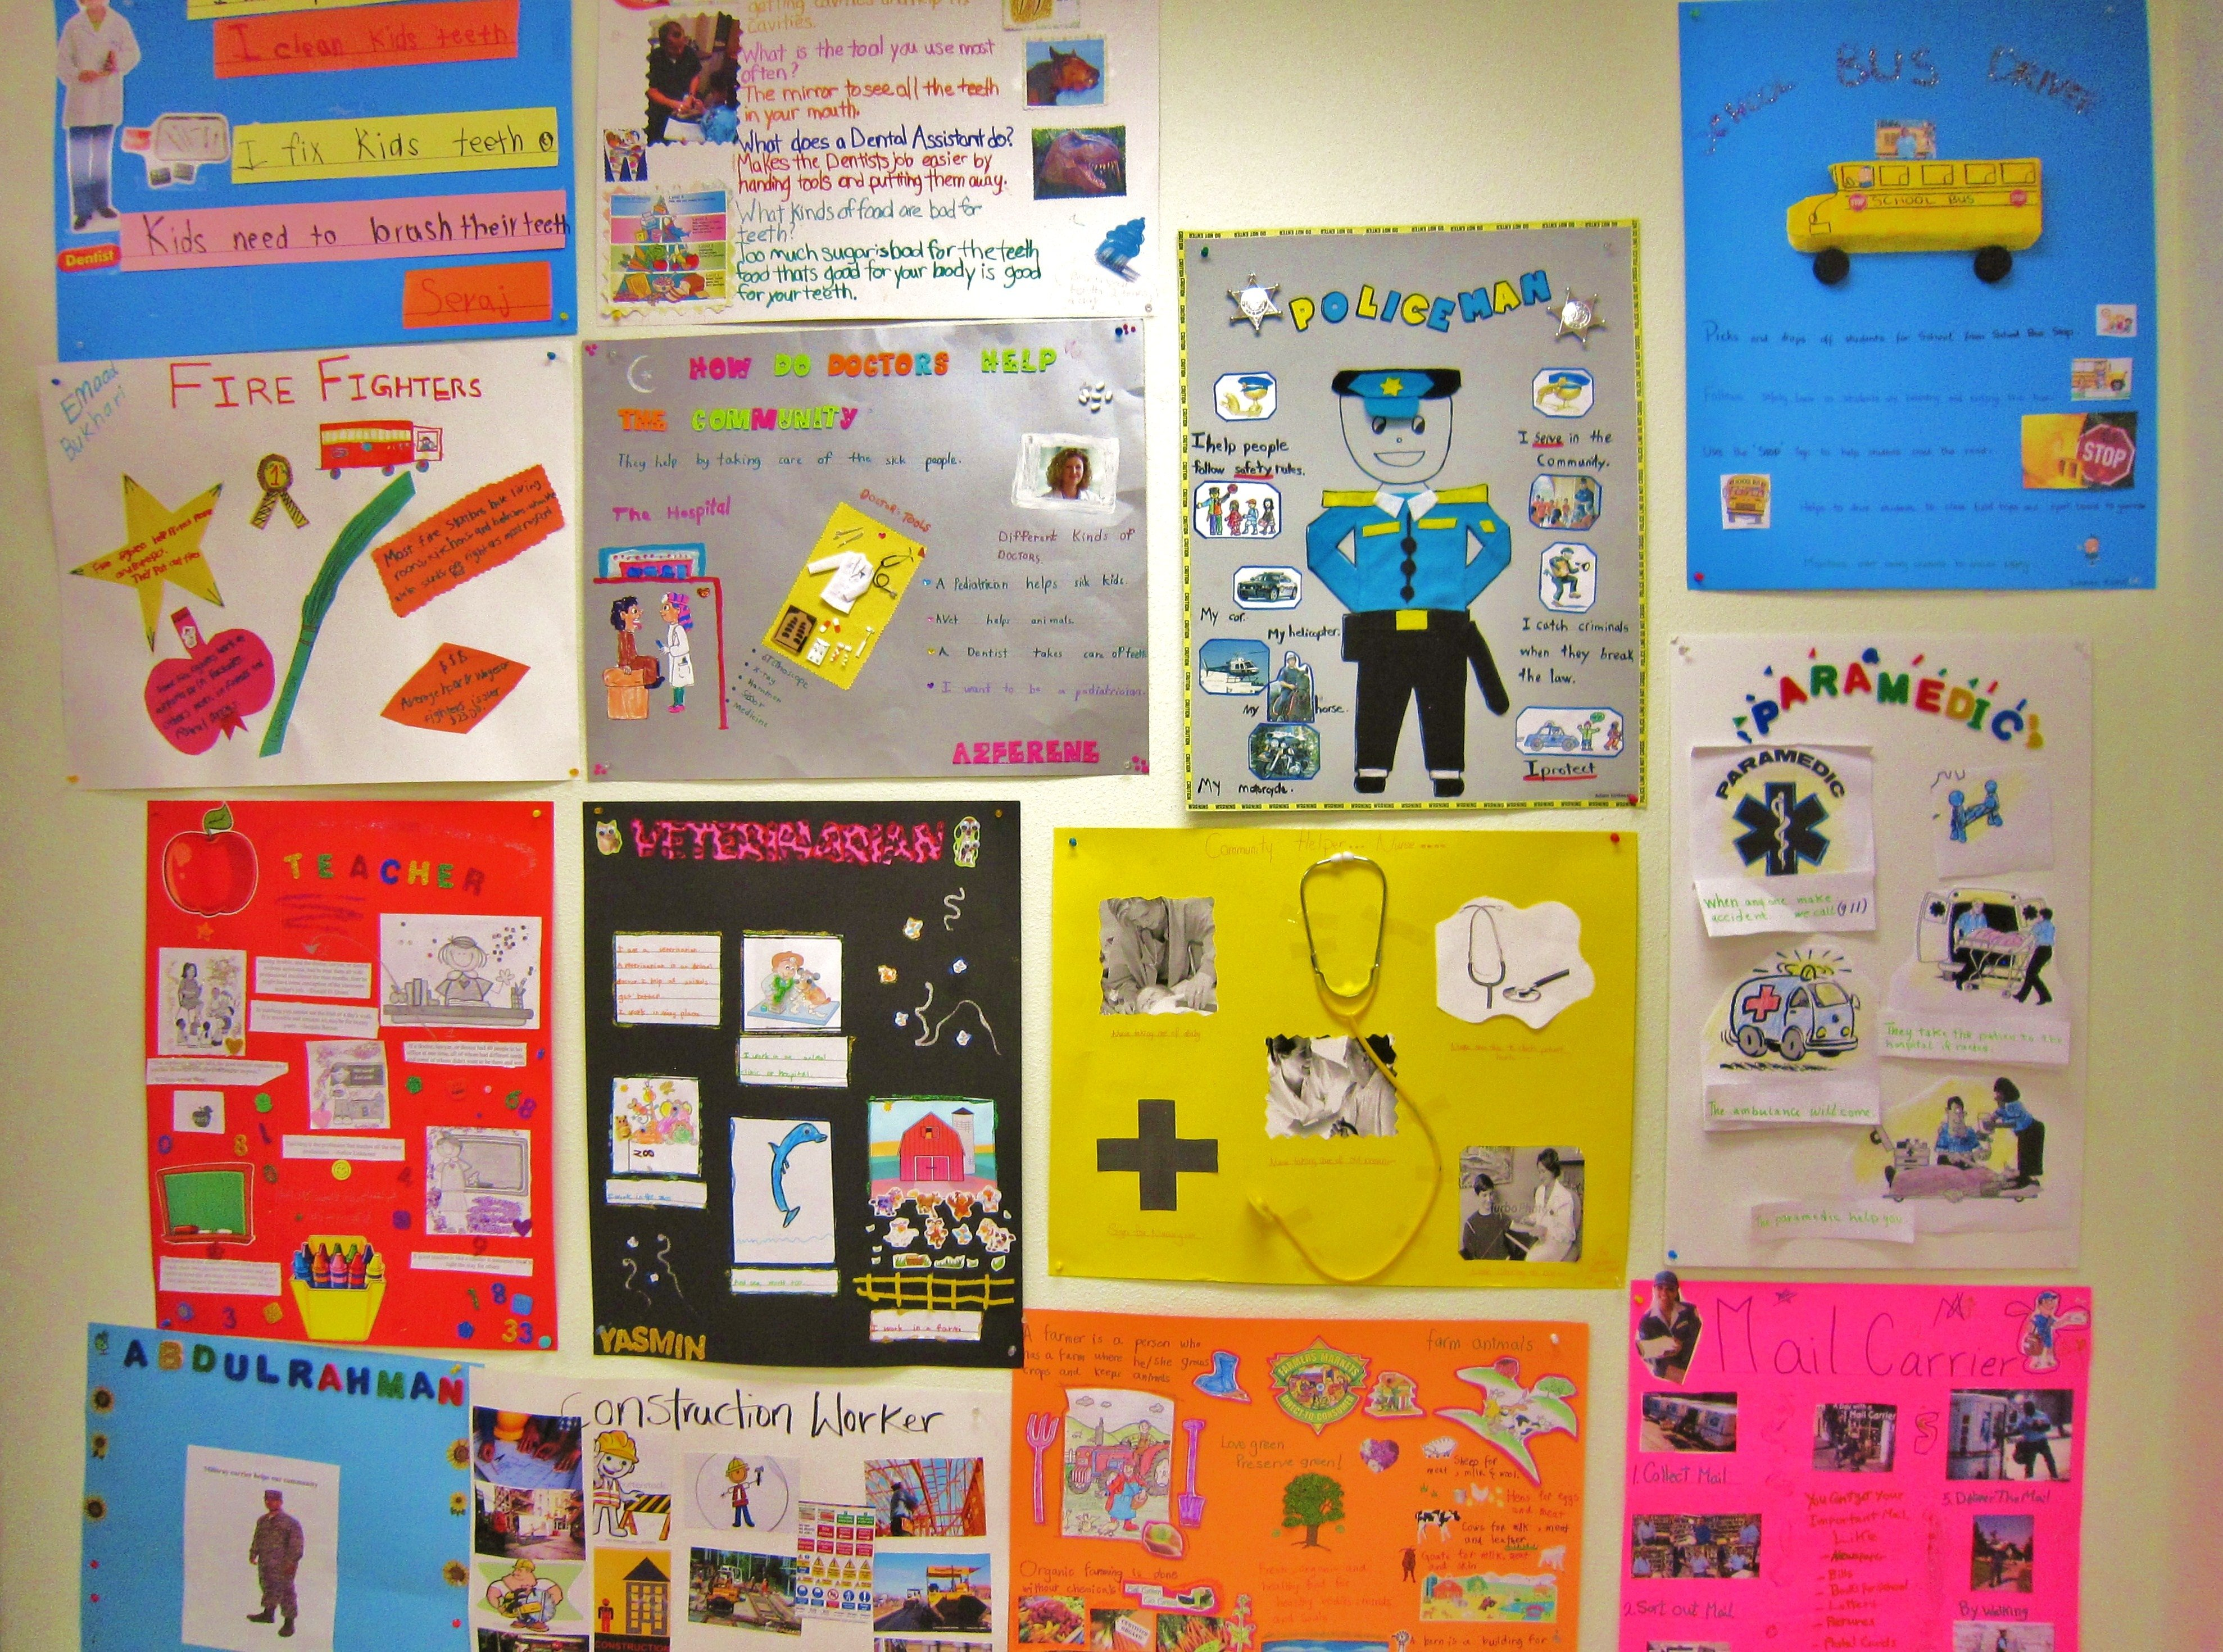 10 Beautiful Creative Project Ideas For School creative poster projects school posters related keywords tierra 2020